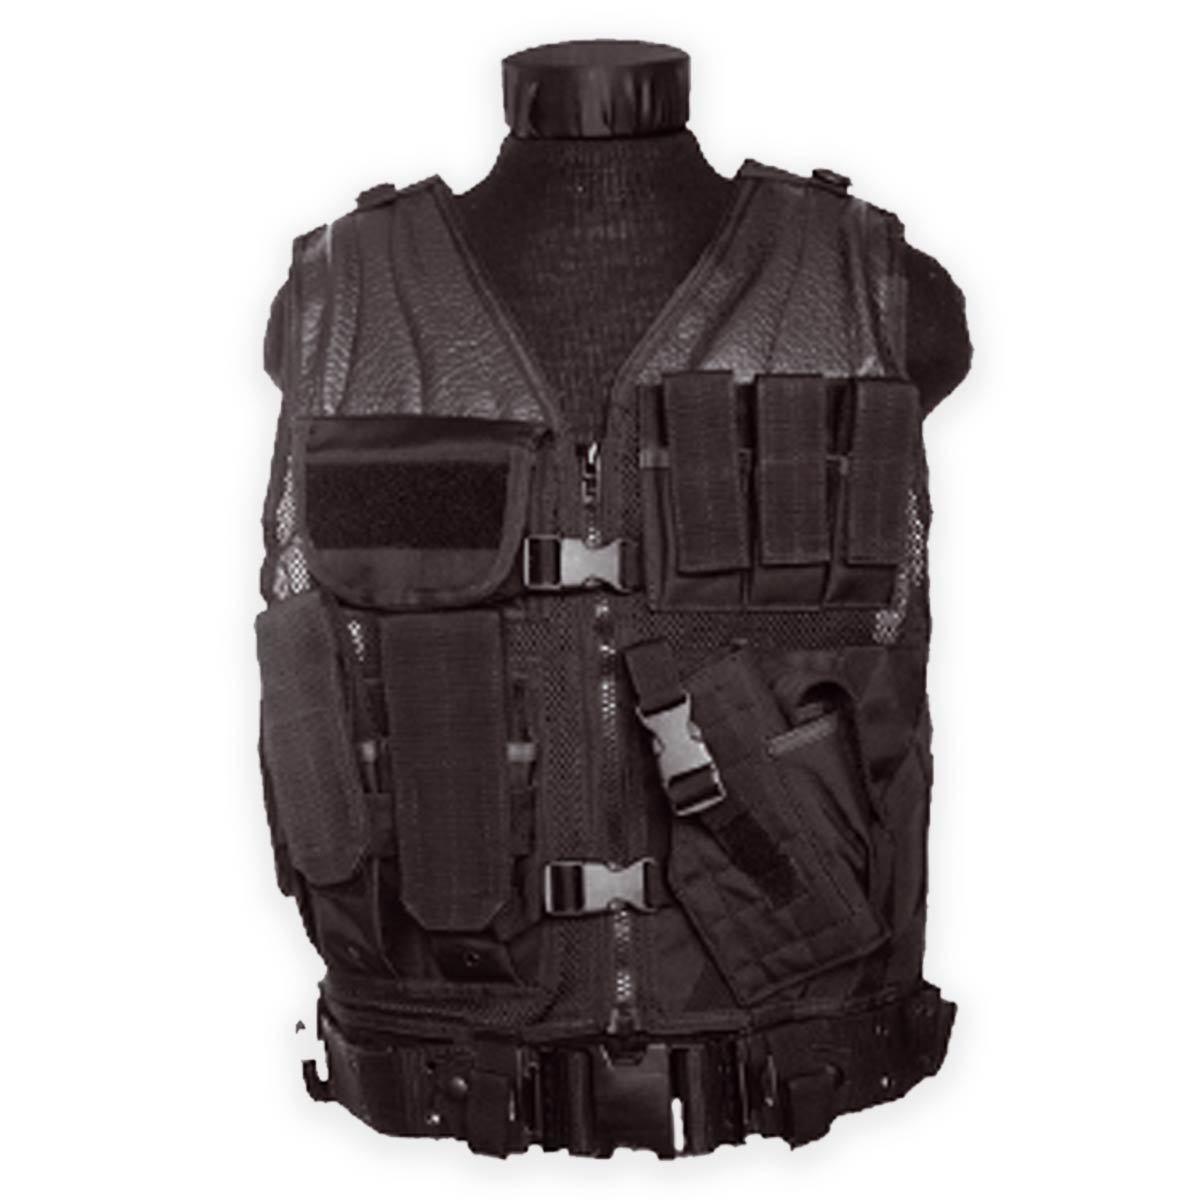 Airsoft USMC Tactical Combat Assault Vest Military  Police Holster Pouches negro  punto de venta